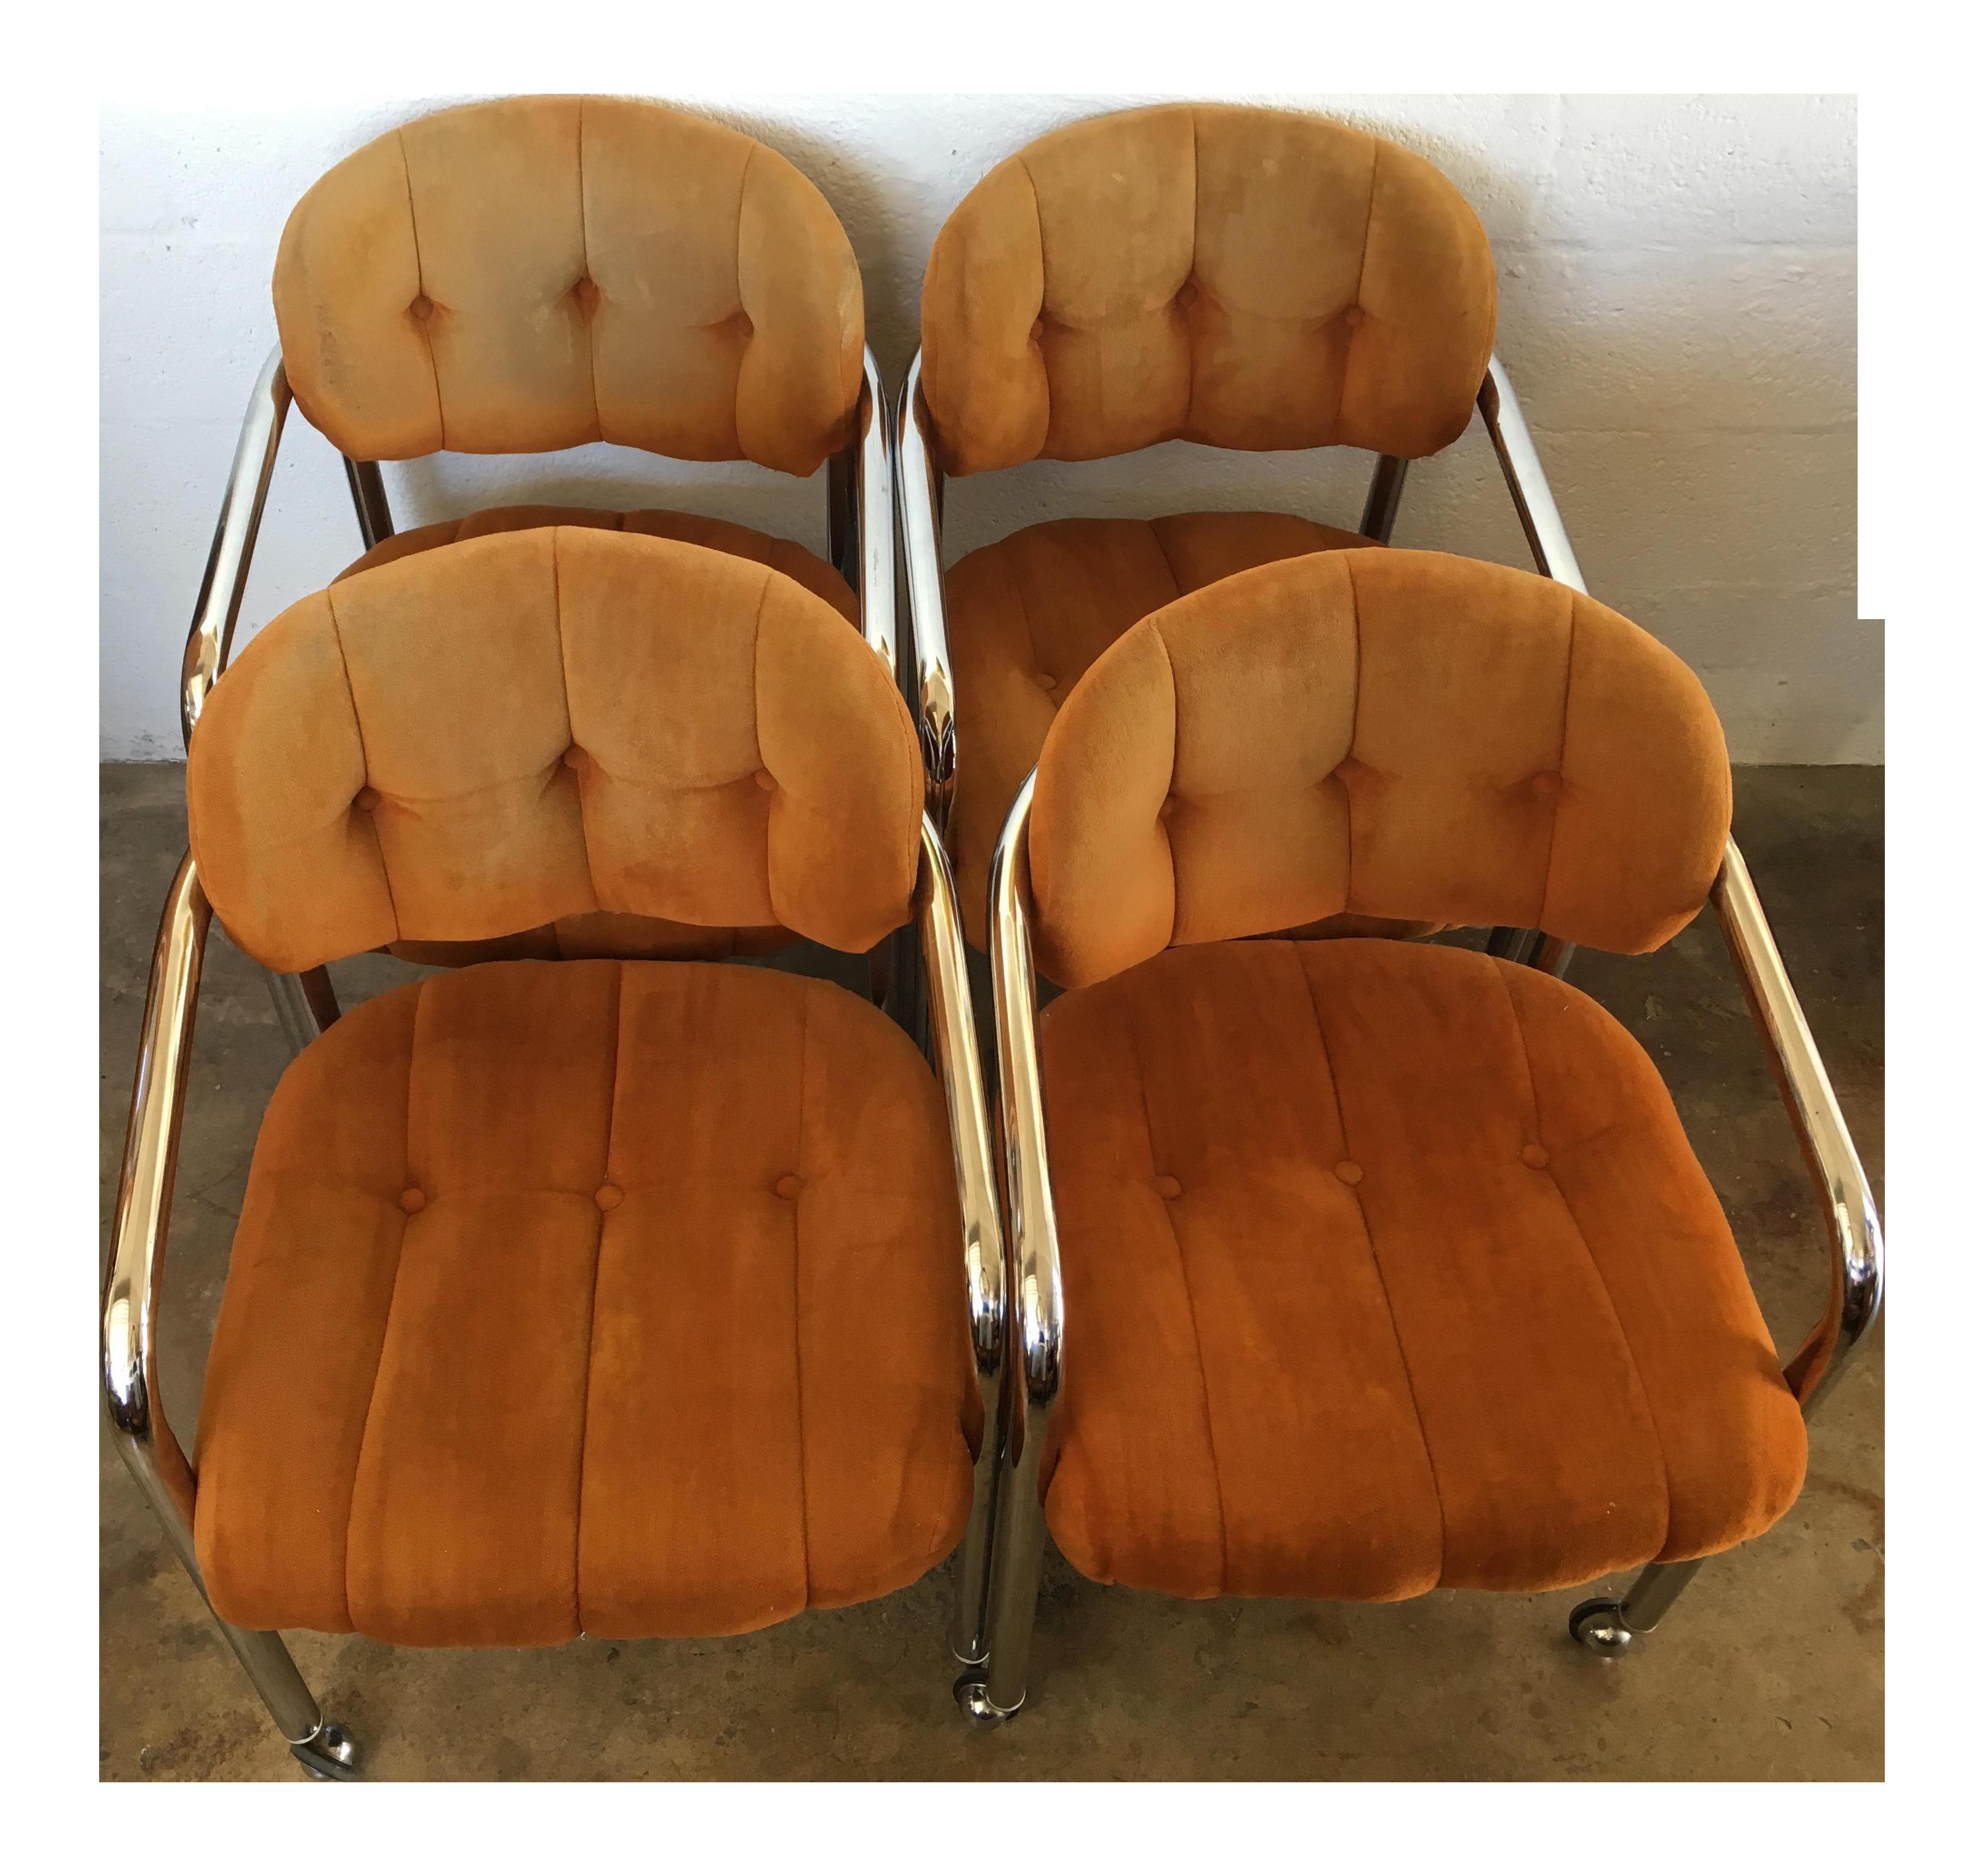 Fine Vintage Mid Century Modern Tubular Chrome Rolling Dining Cjindustries Chair Design For Home Cjindustriesco